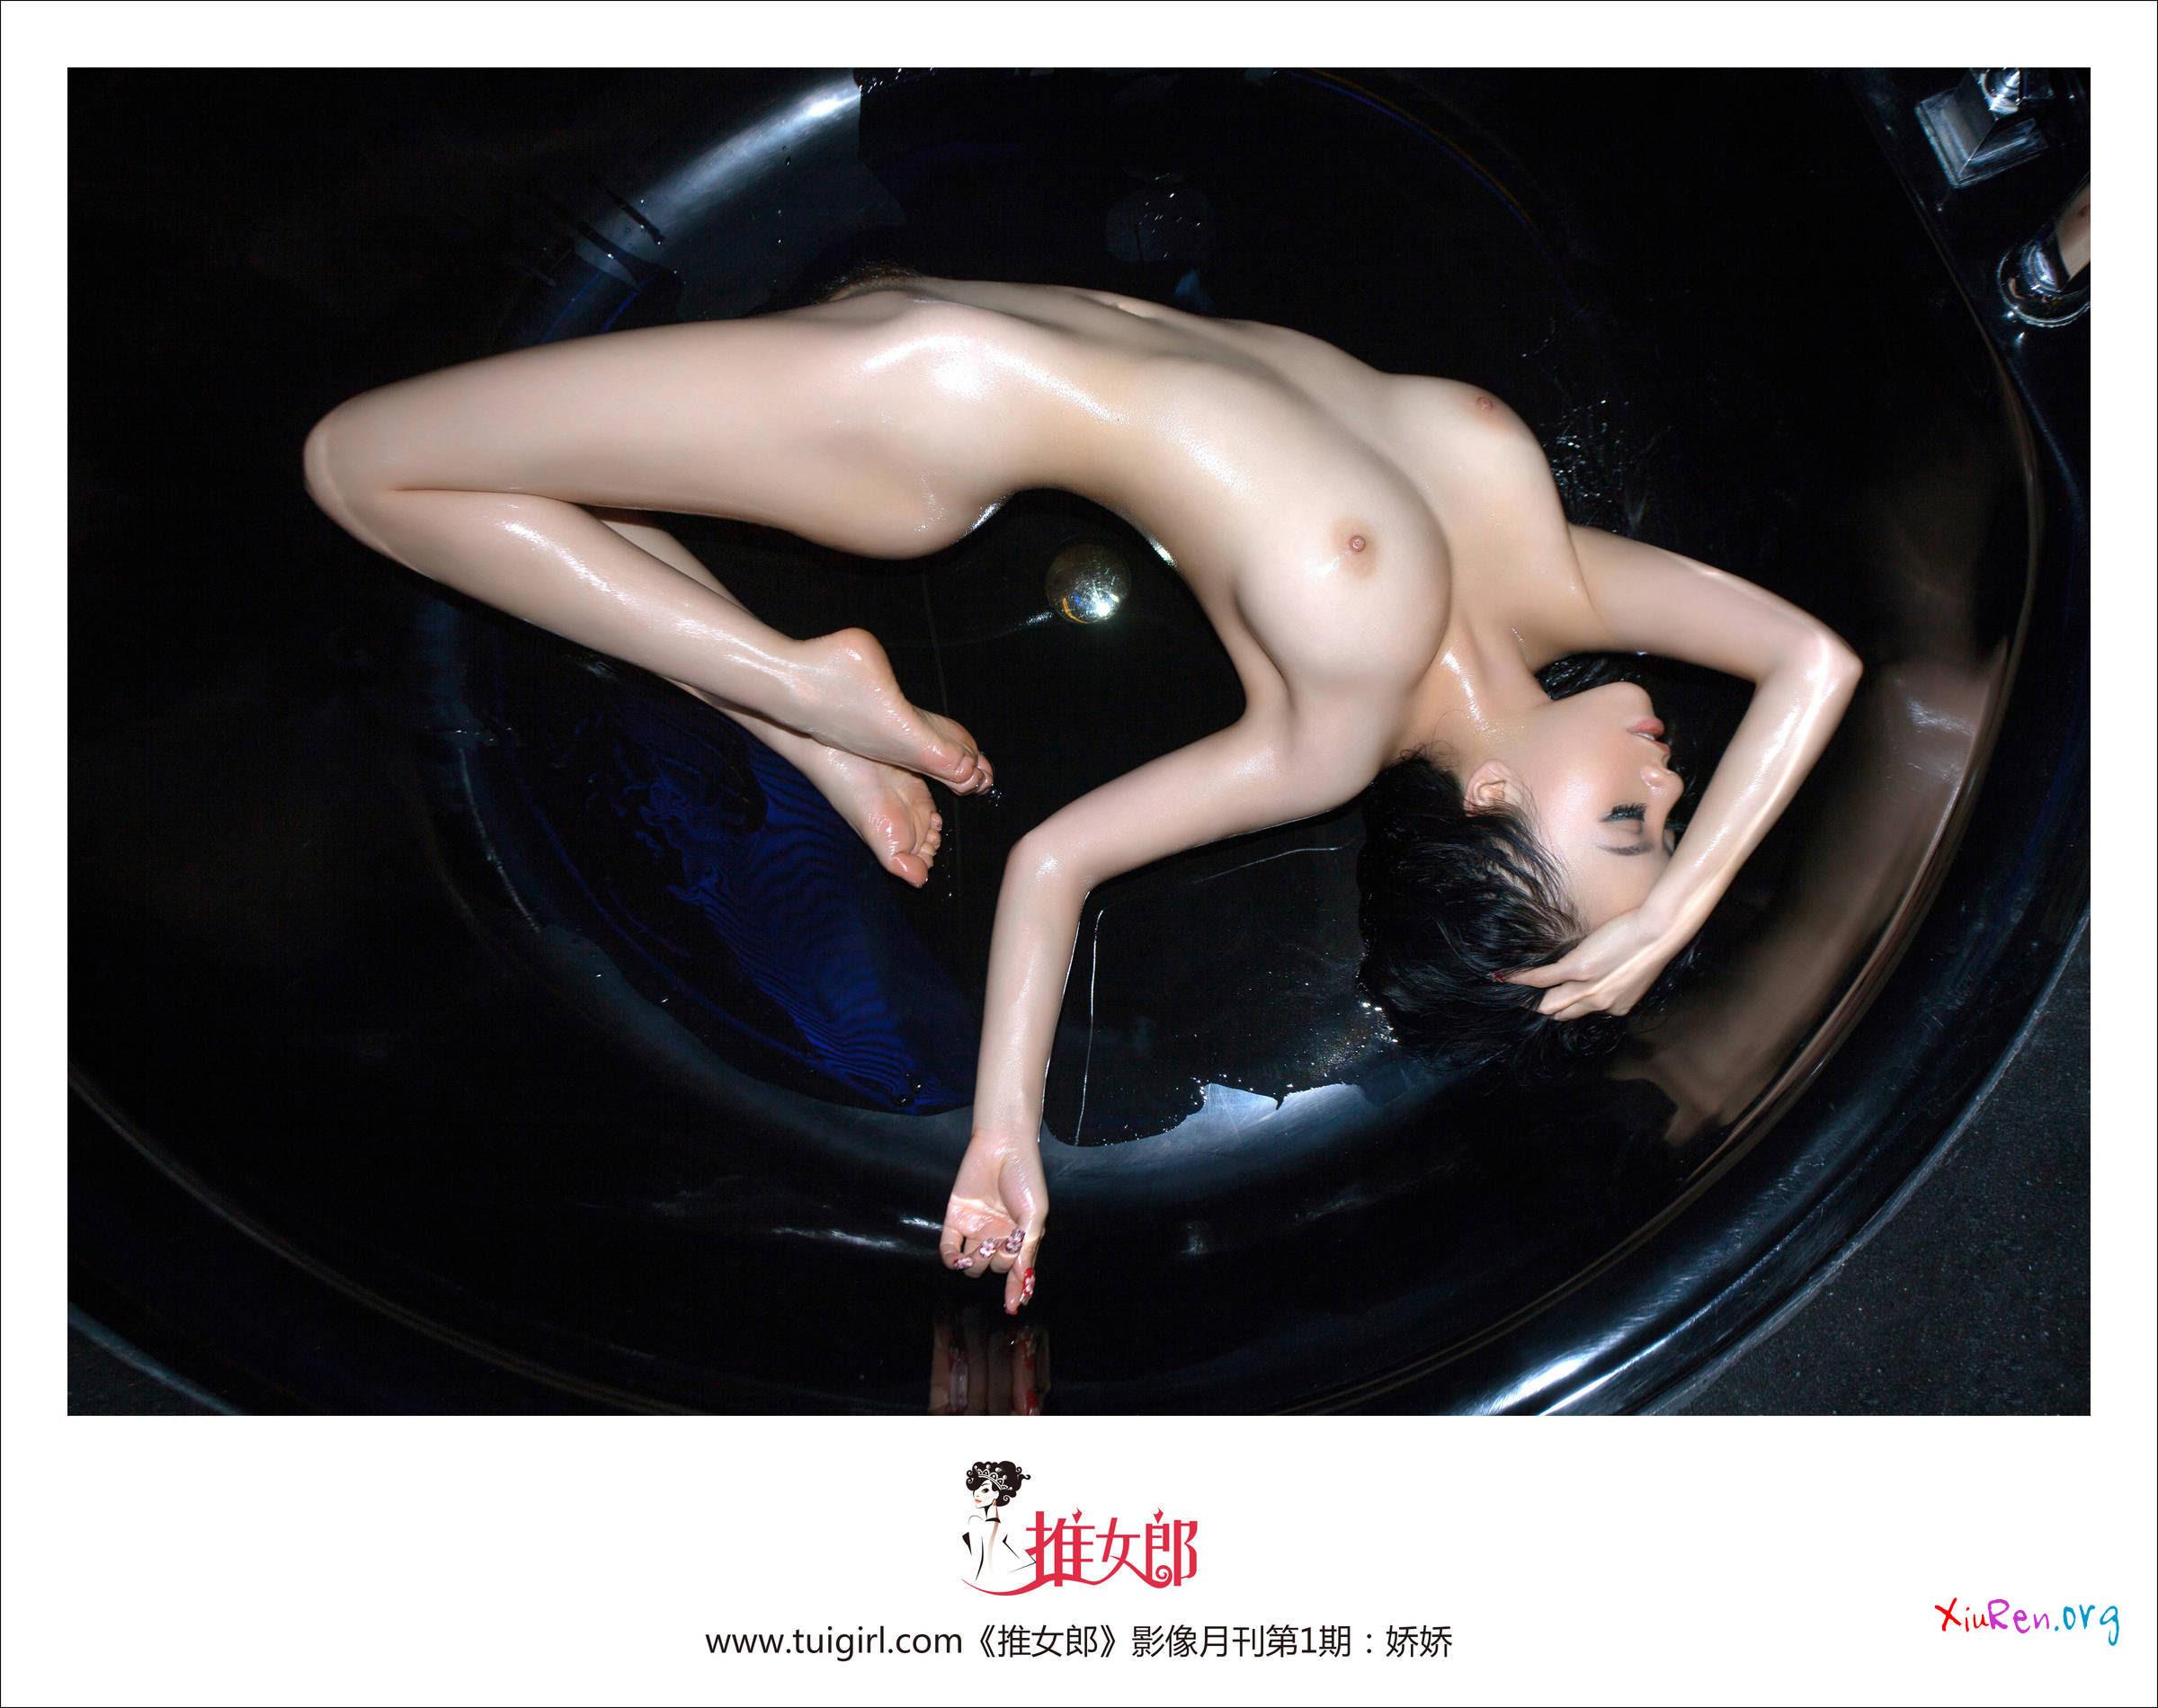 tuigirl-001-jiaojiao-32.jpg